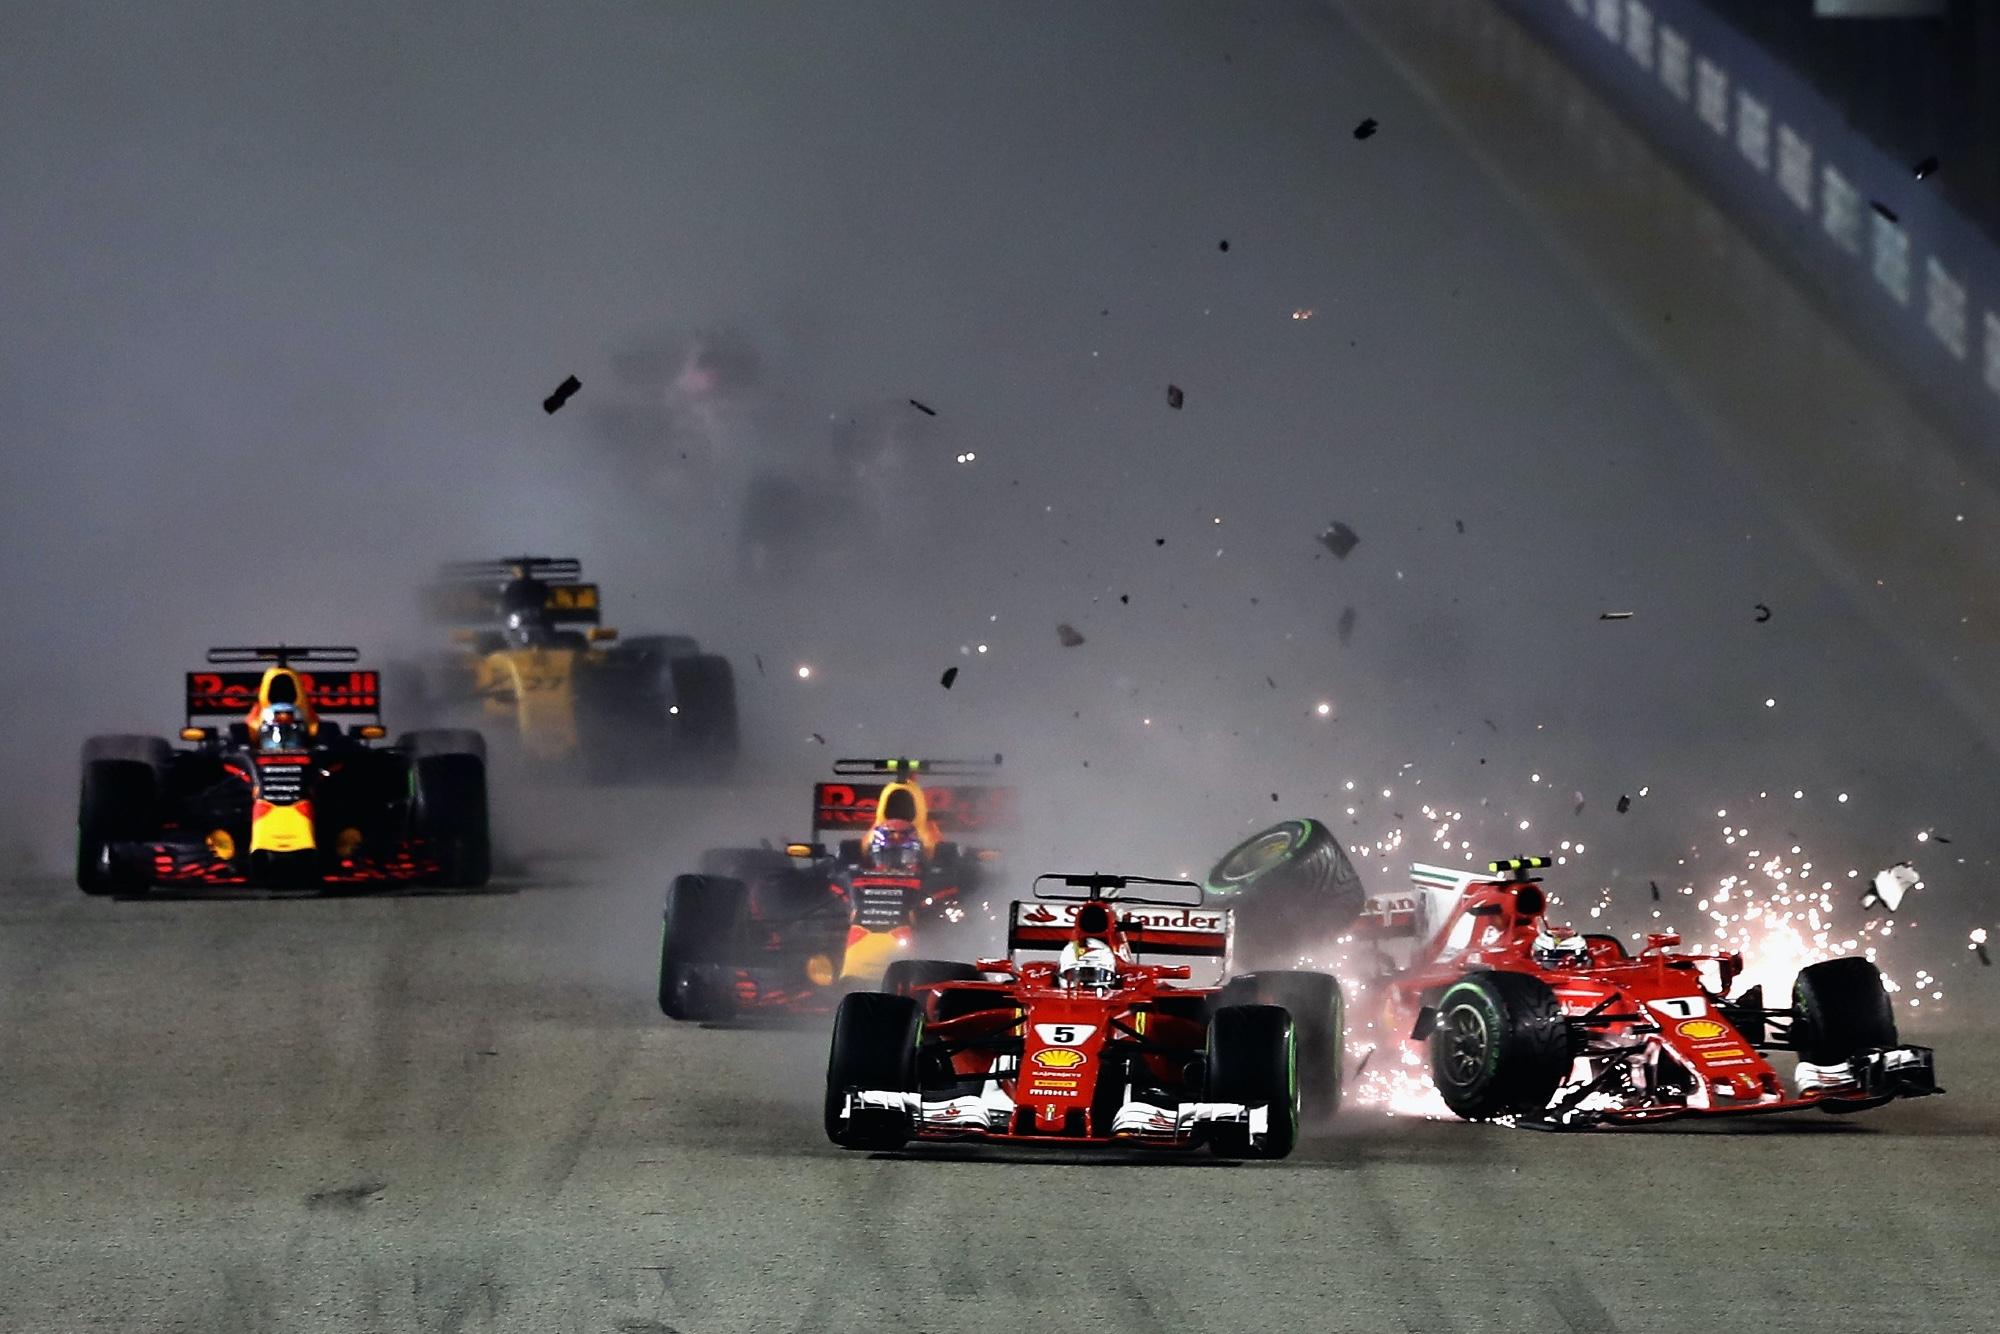 Singapore GP start 2017